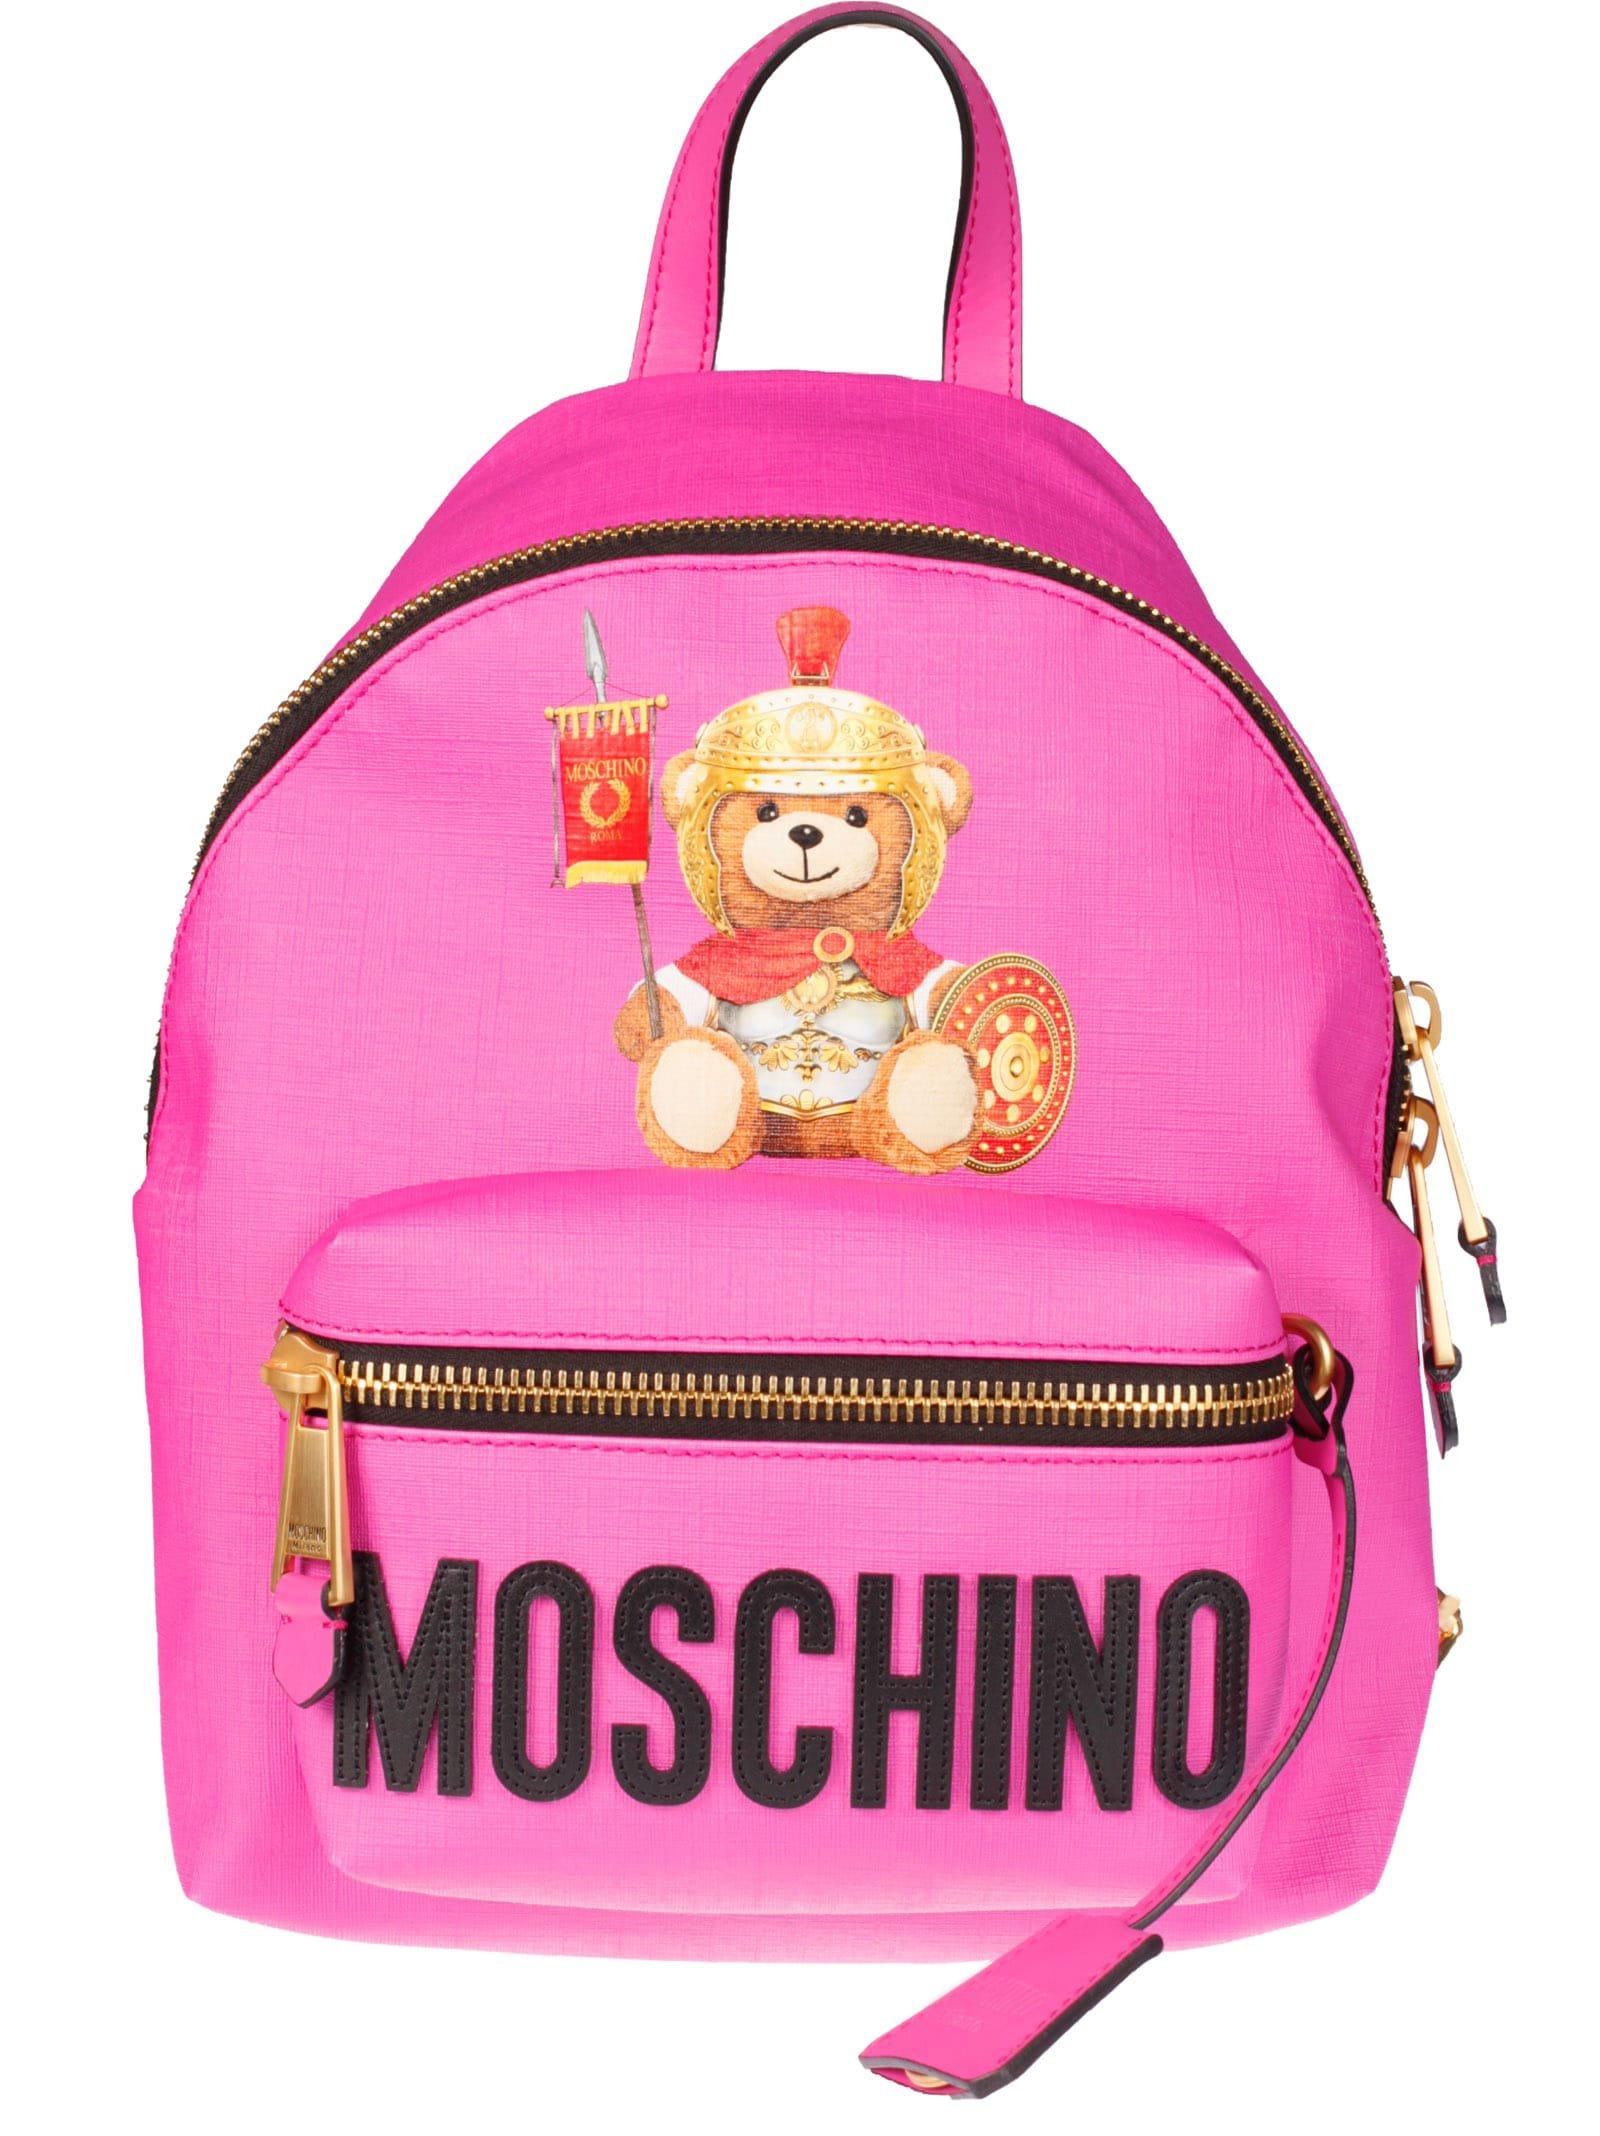 Moschino Teddy Print Backpack